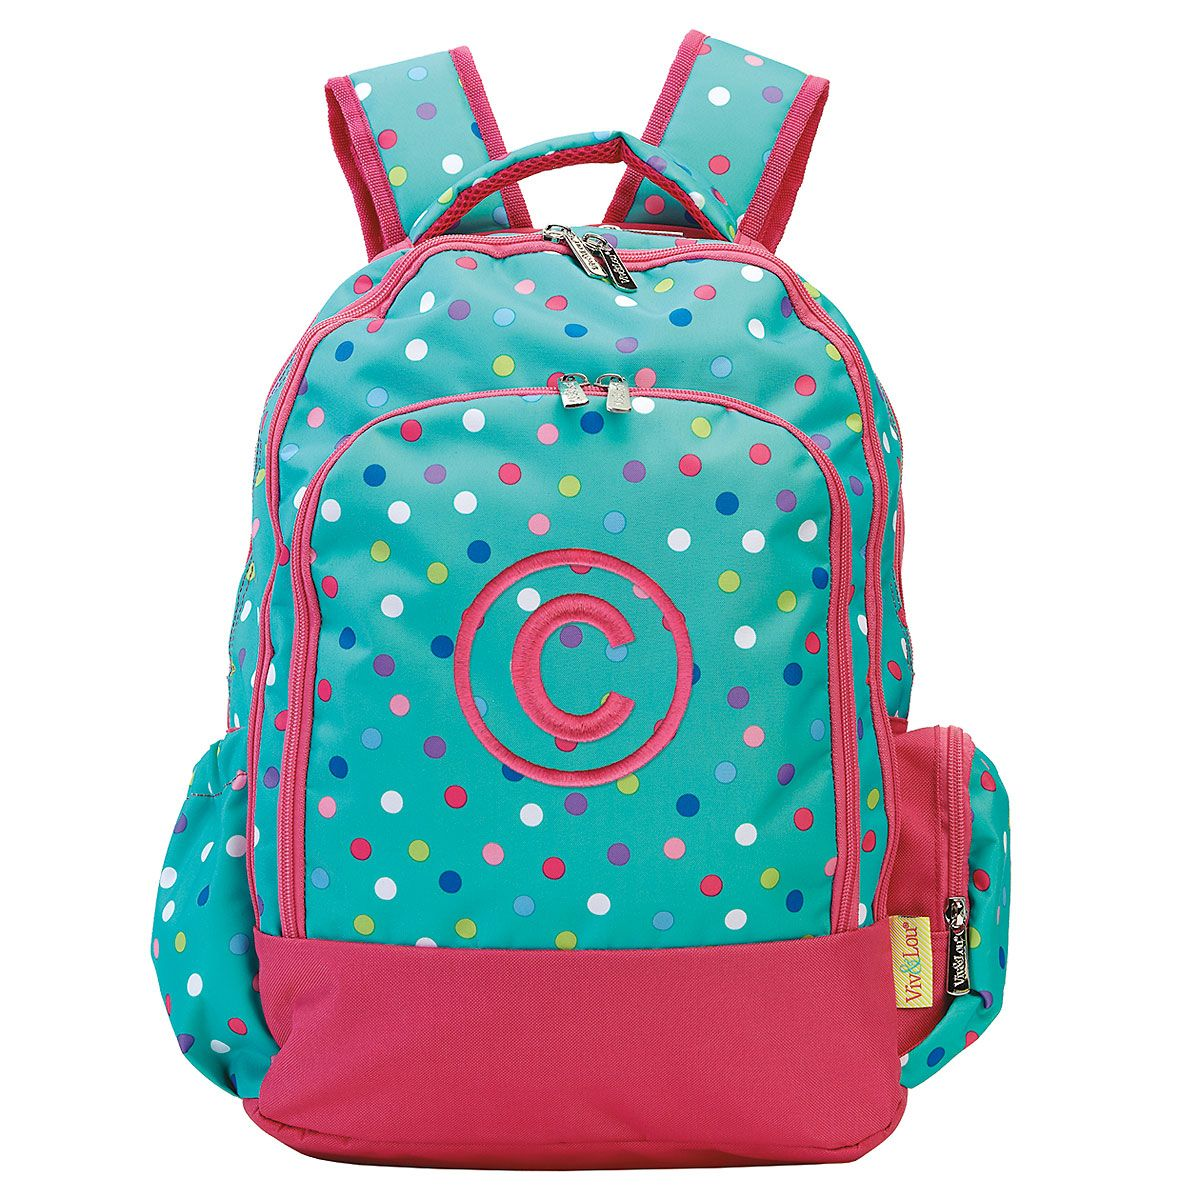 Personalized Lottie Backpack